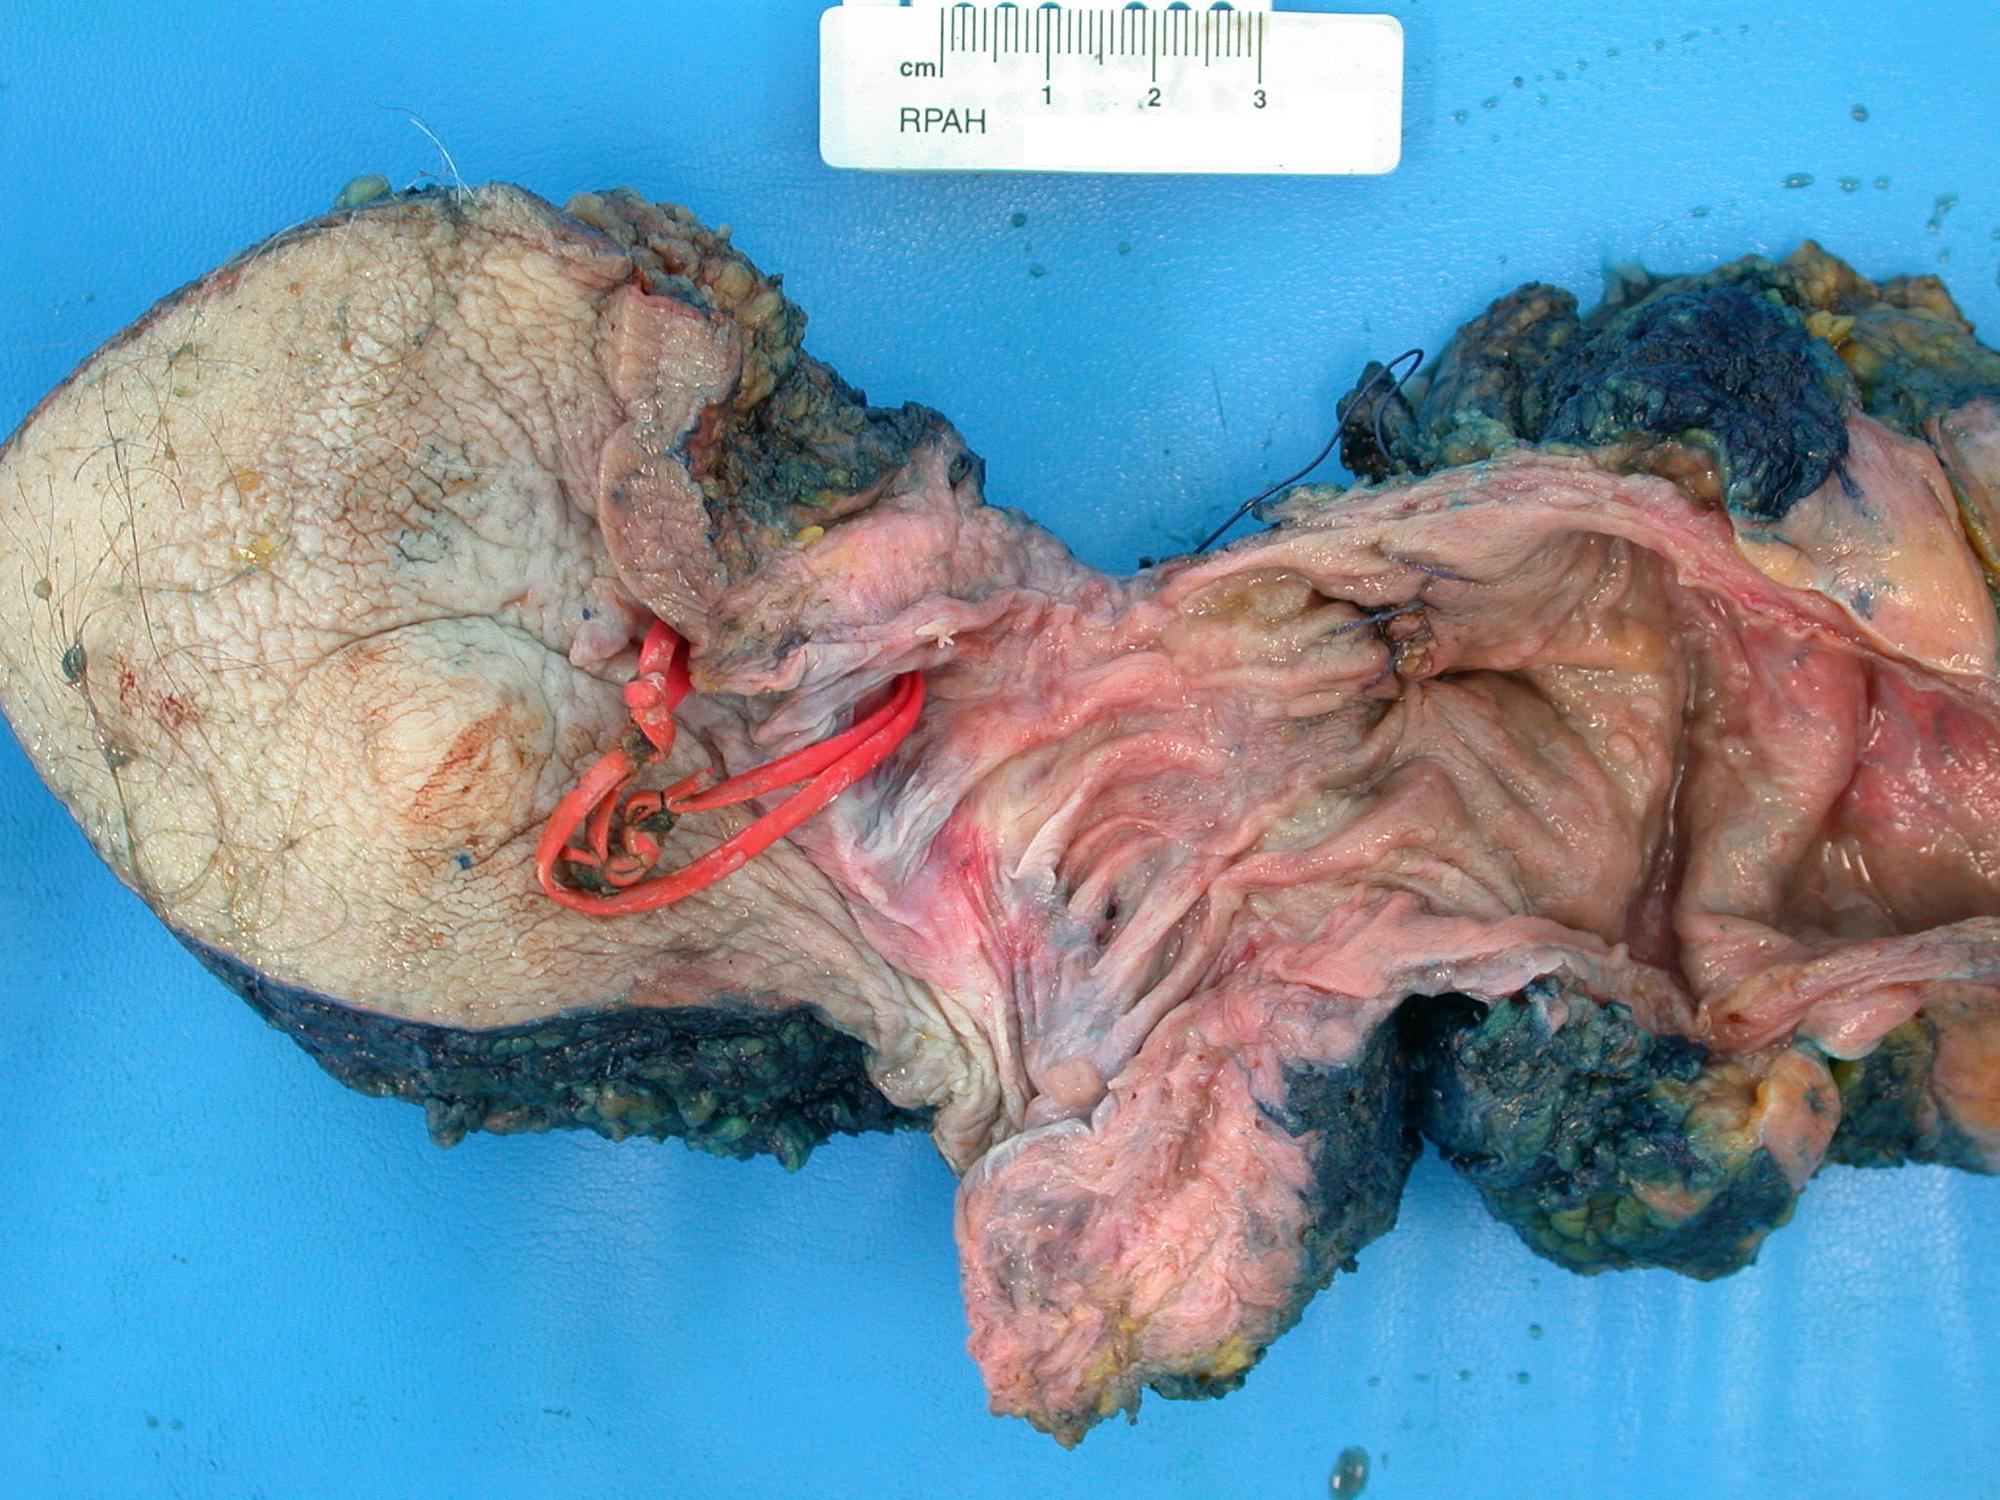 cureus synchronous sigmoid colon cancer seeding a fistula in ano